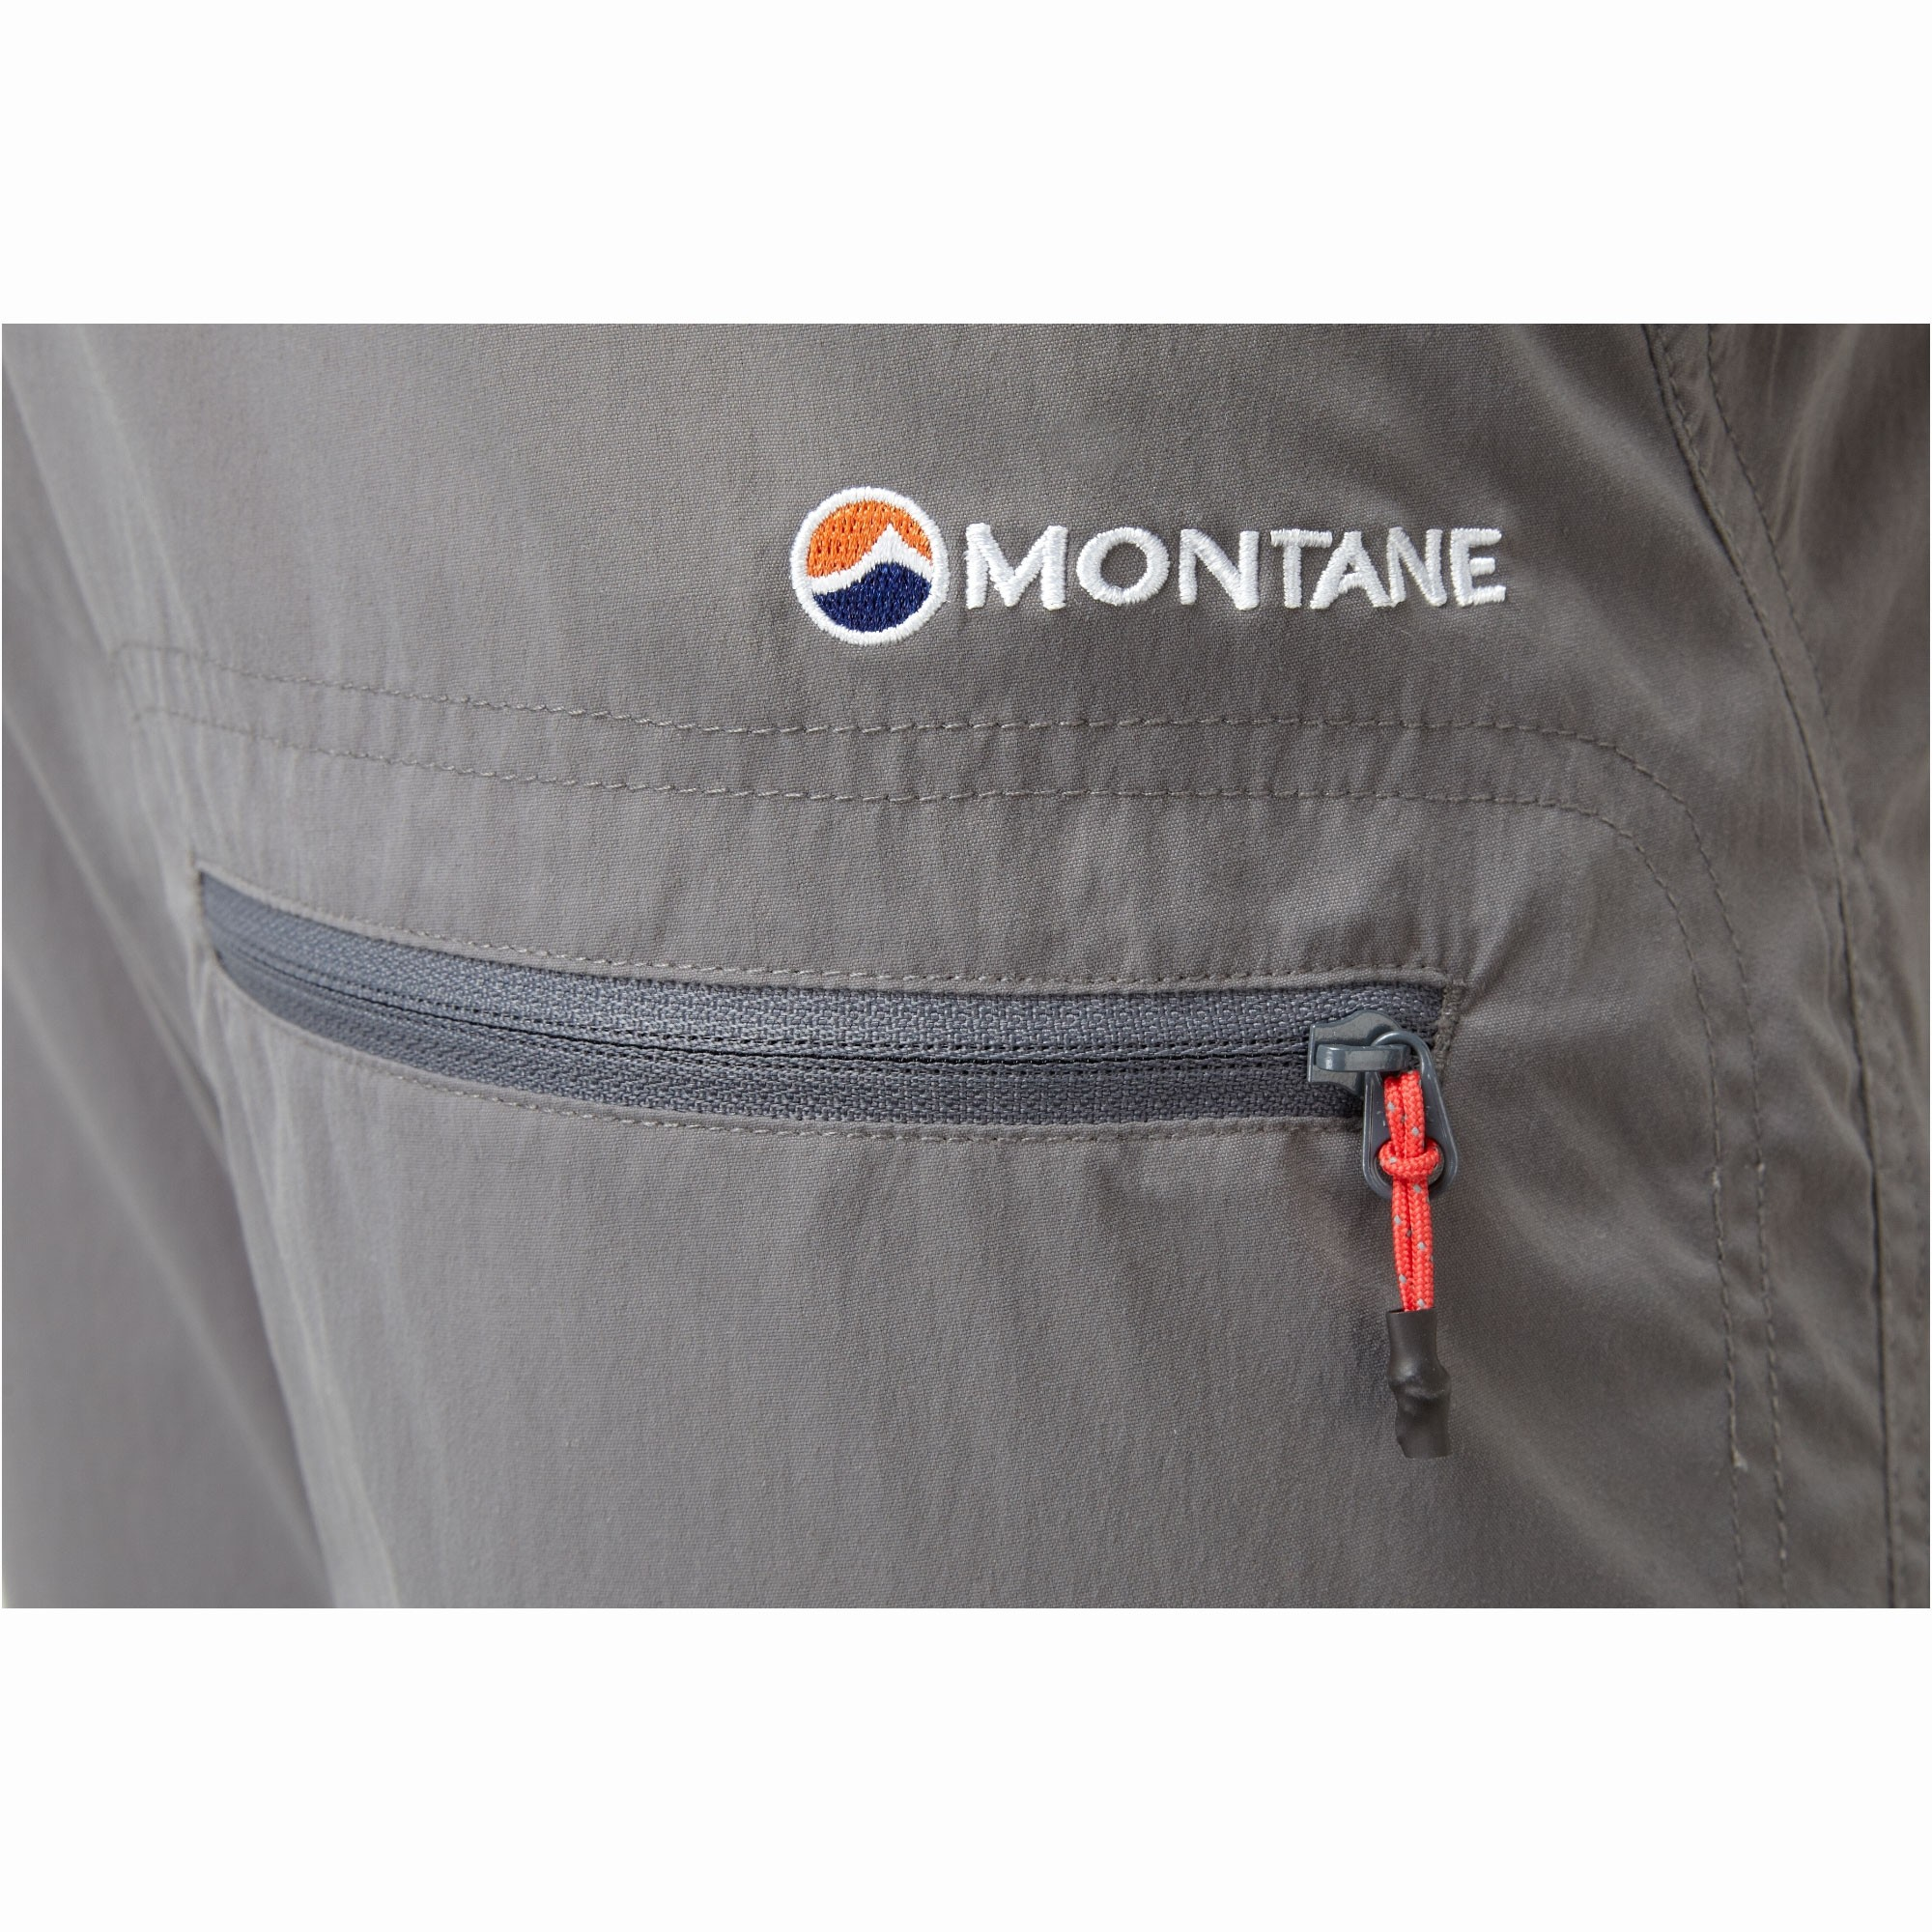 Montane Terra Pack Men's Pants - Mercury - Detail